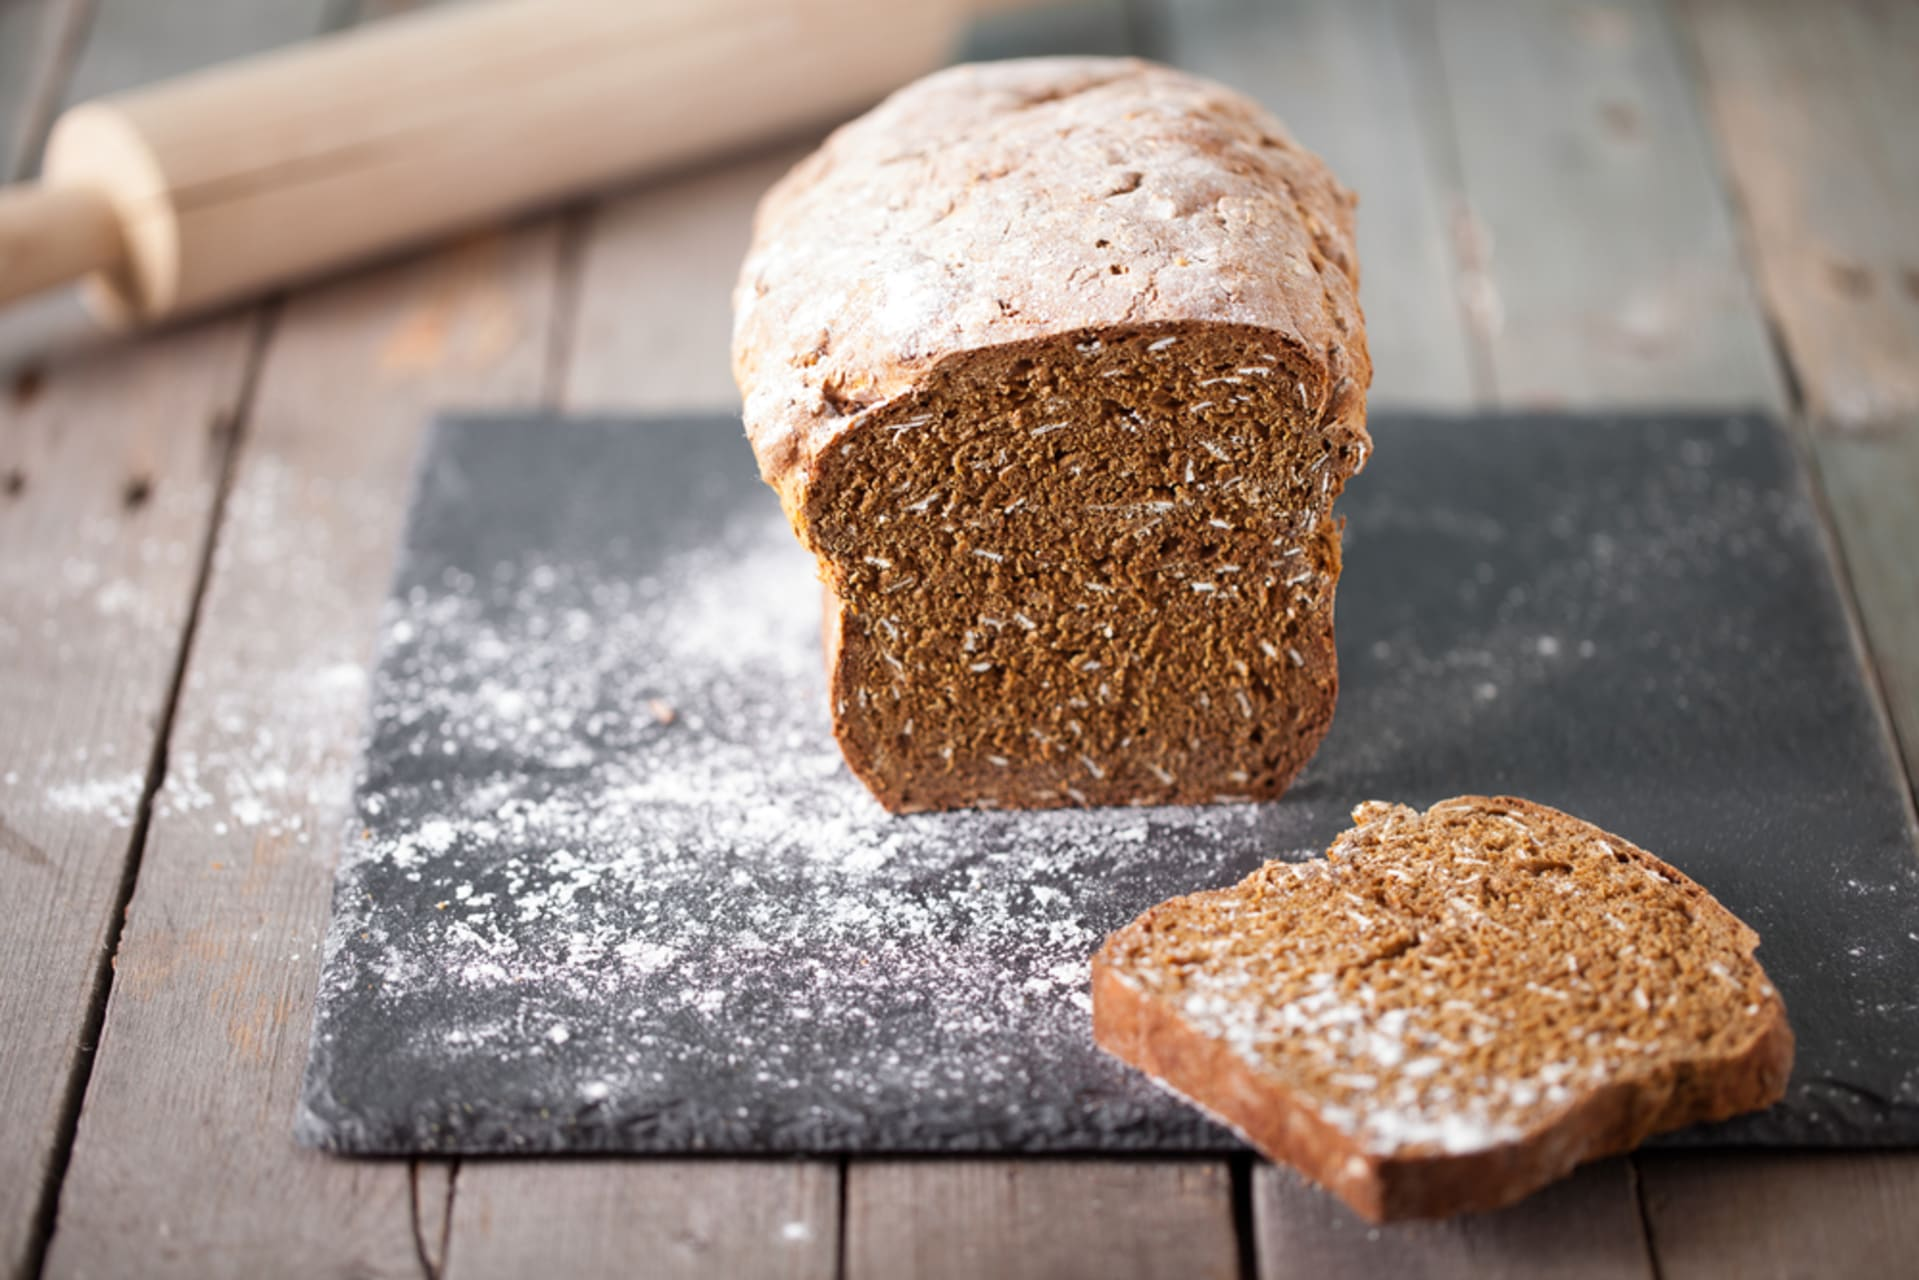 Little Rock - The True Story of St. Patrick & Baking Irish Brown Bread